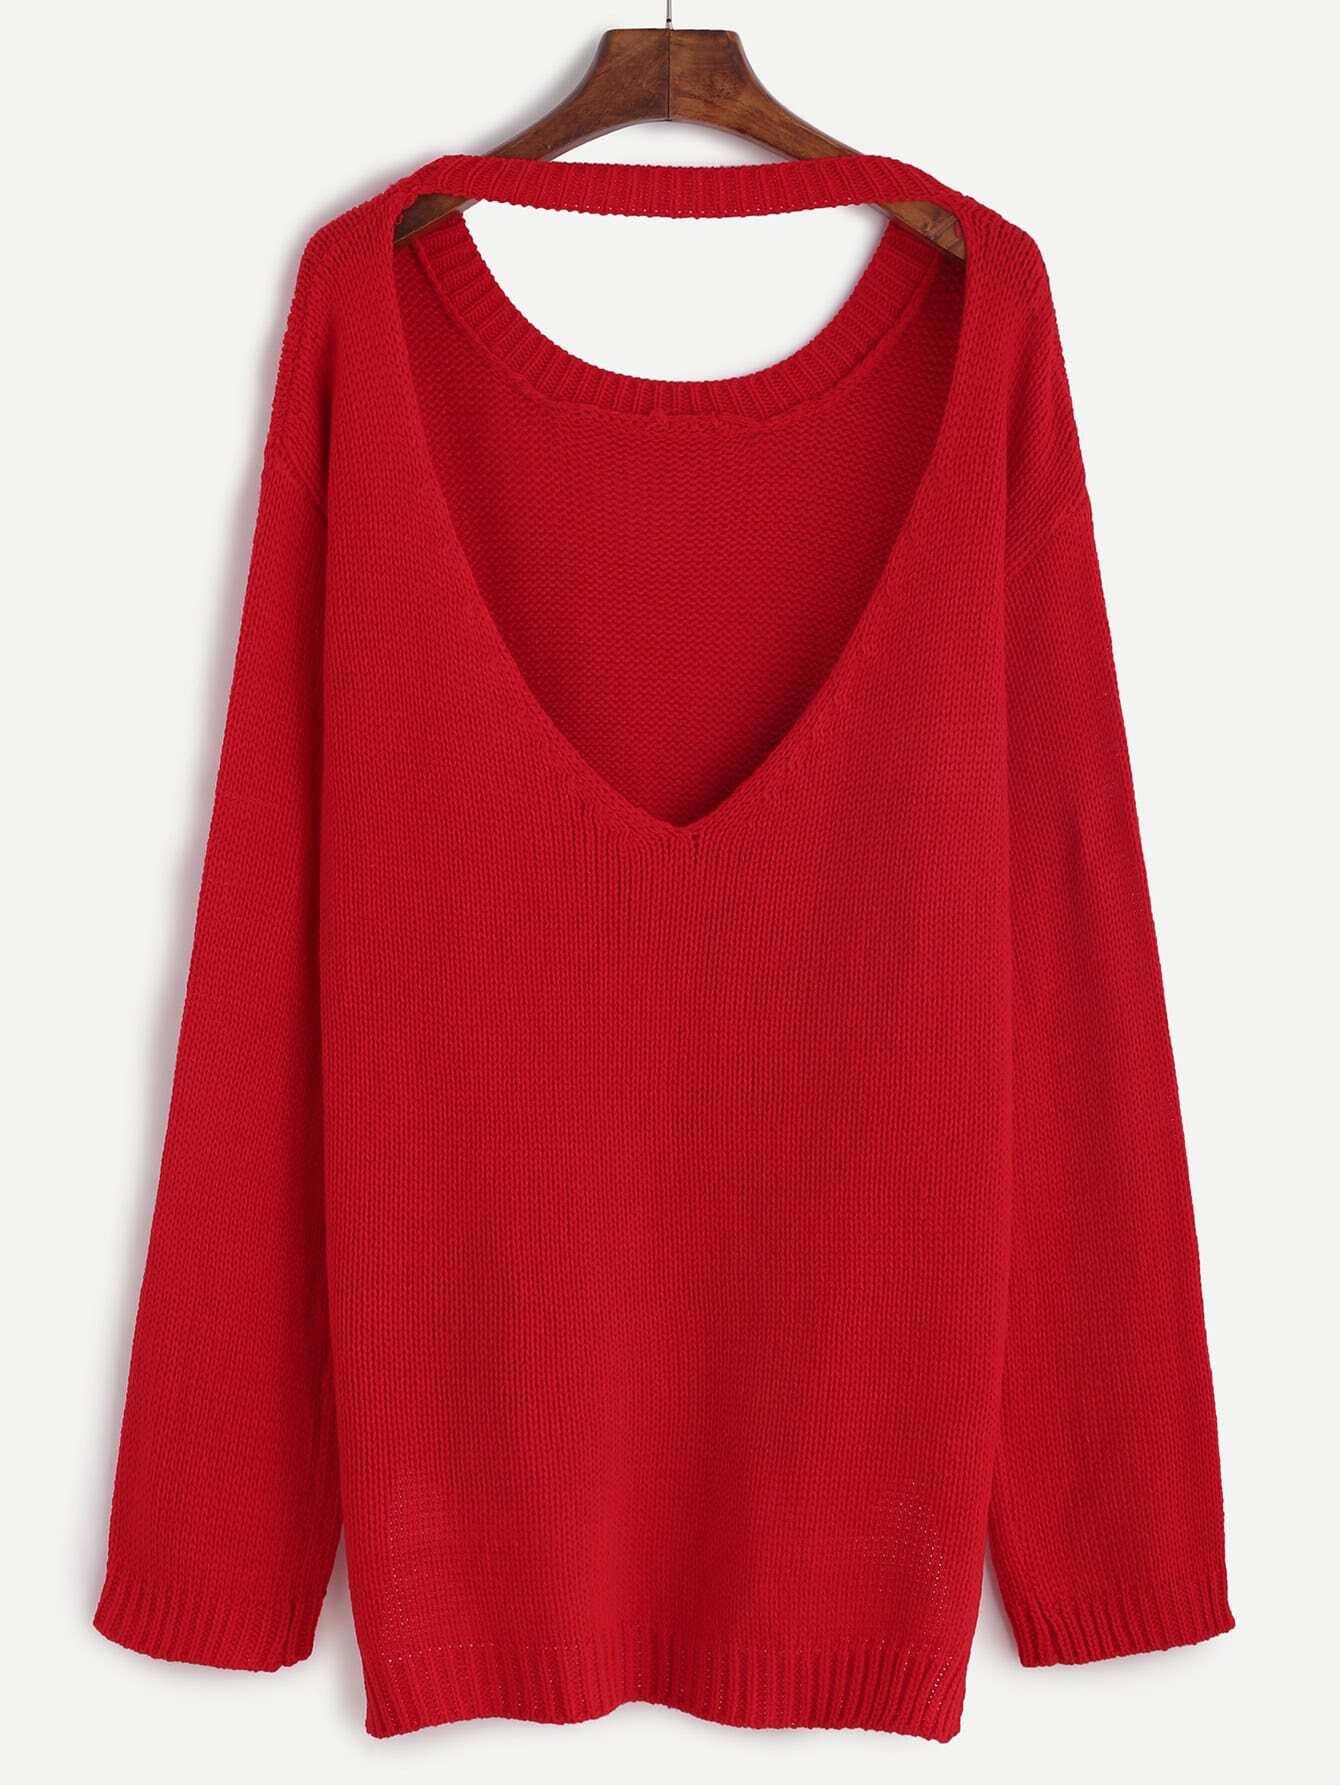 Red Cutout V Back High Low Sweater -SheIn(Sheinside)